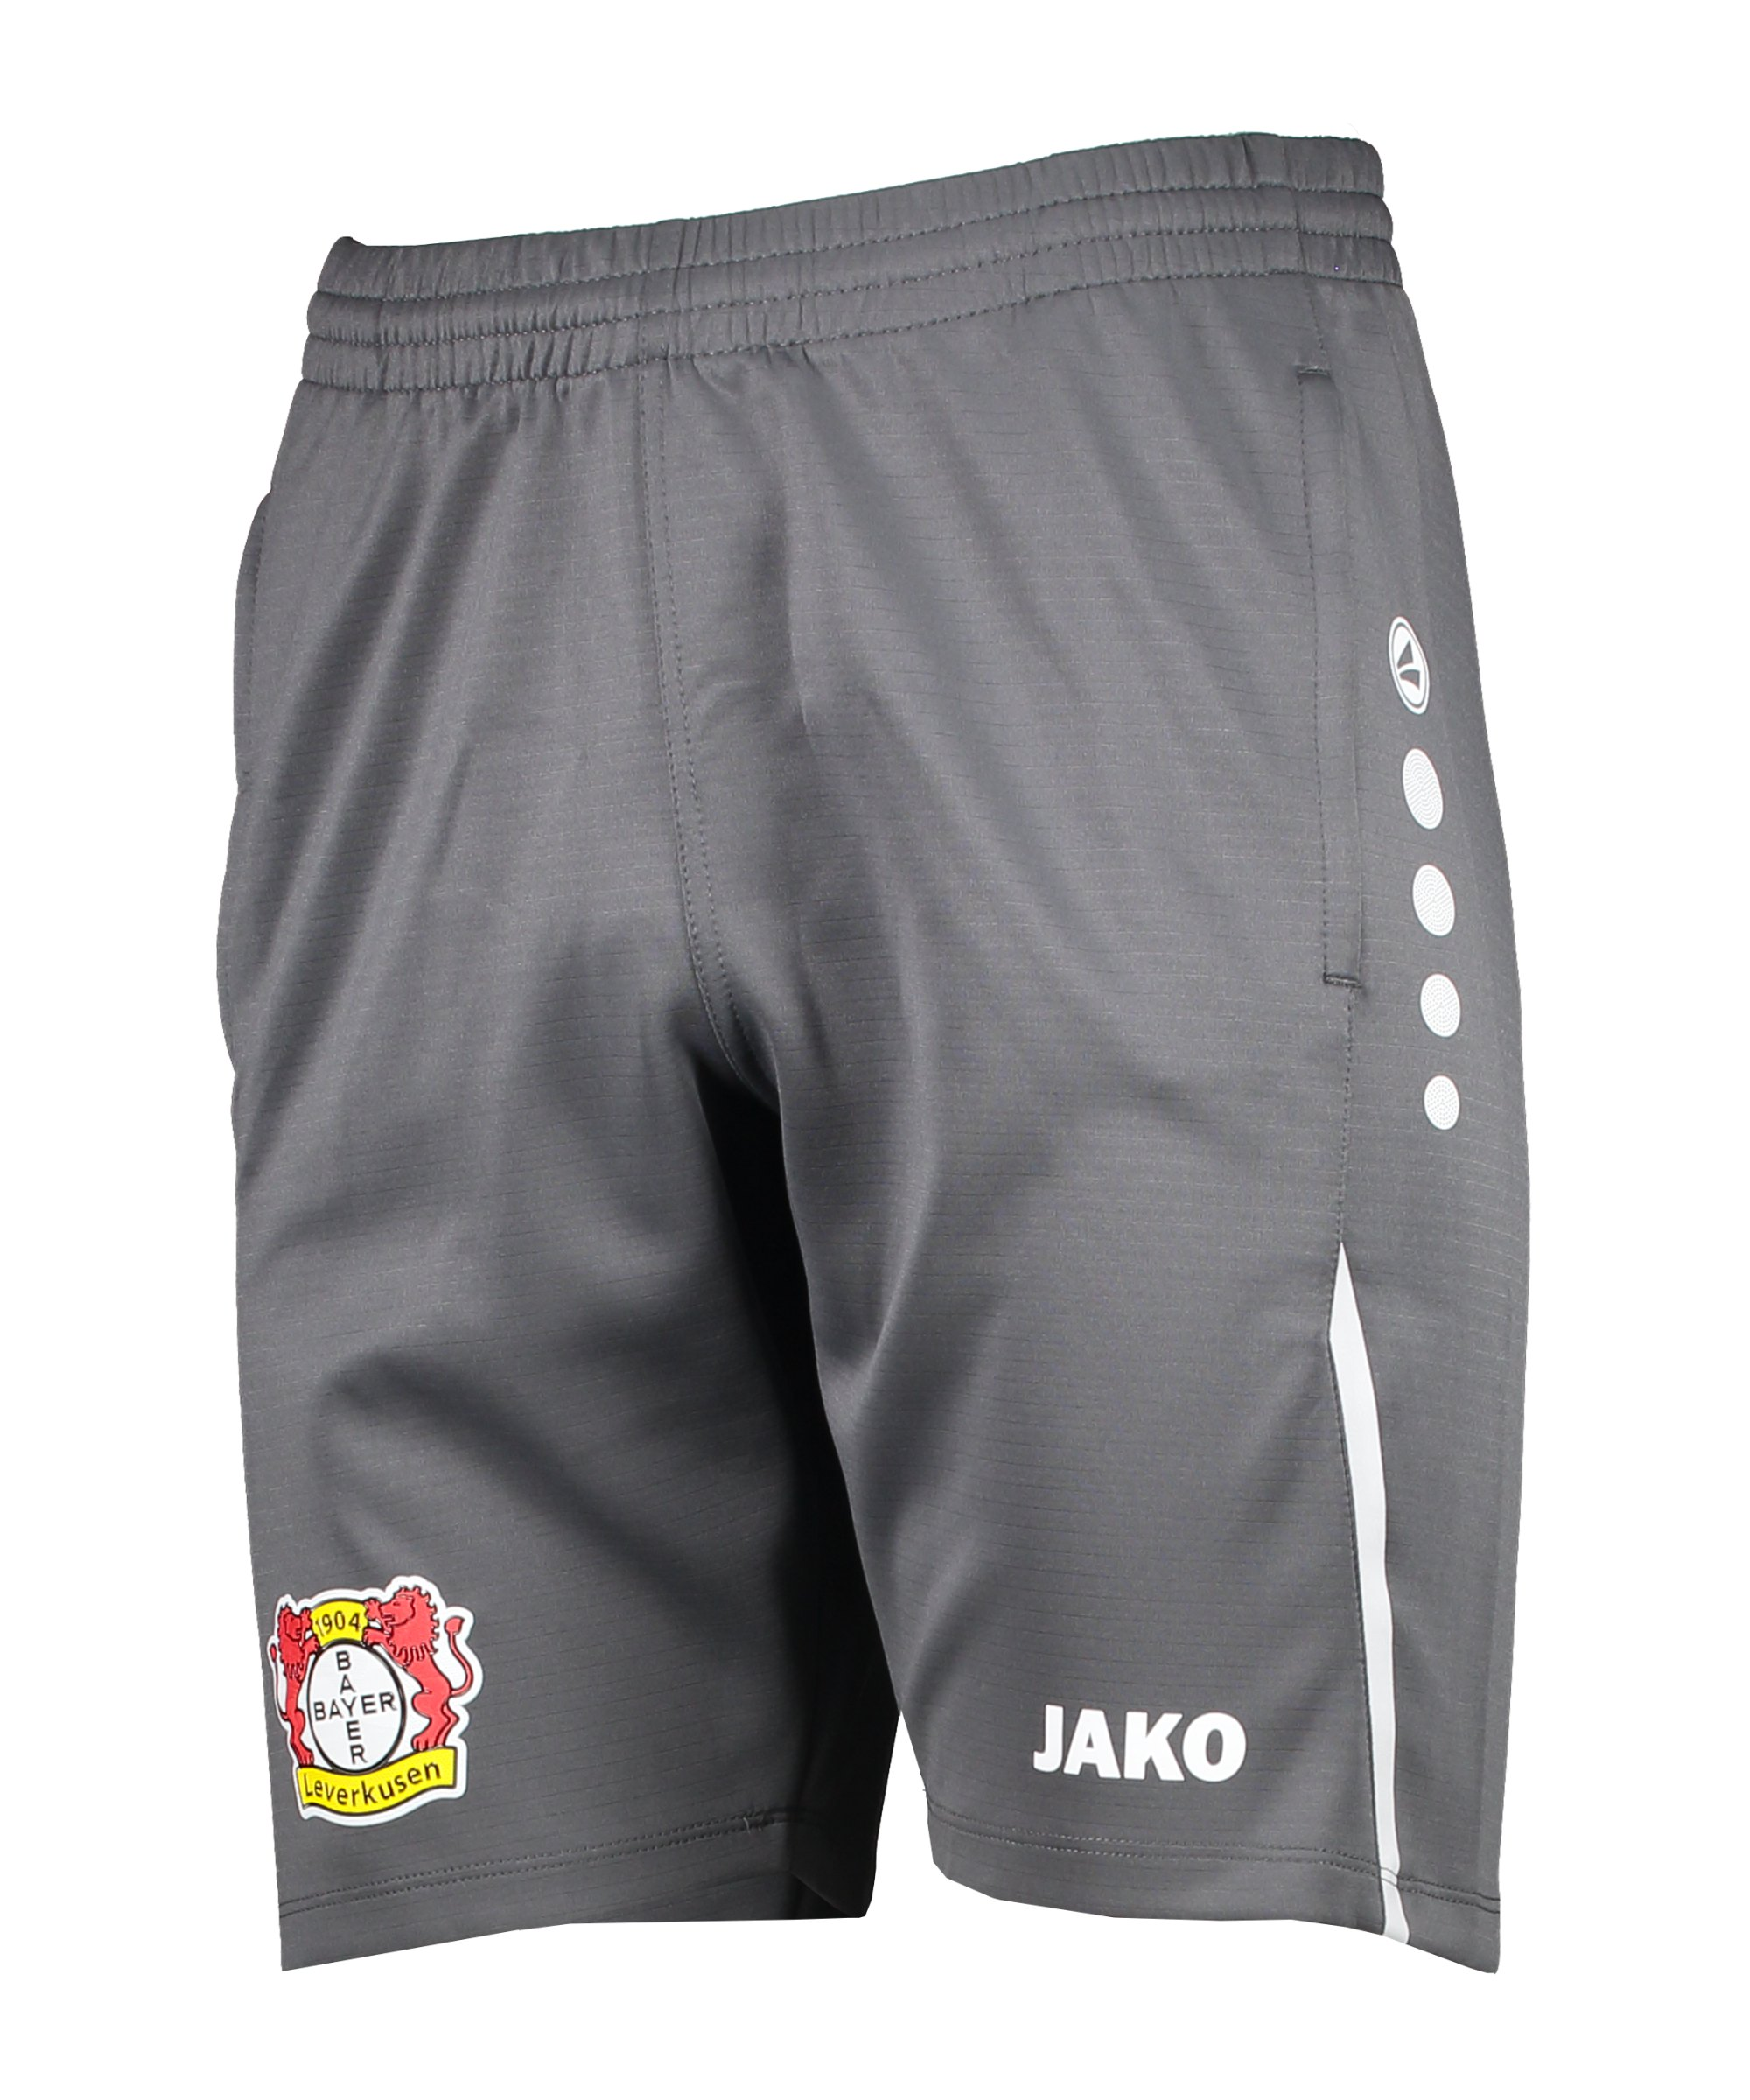 JAKO Bayer 04 Leverkusen Challenge Trainingsshort Grau F821 - grau